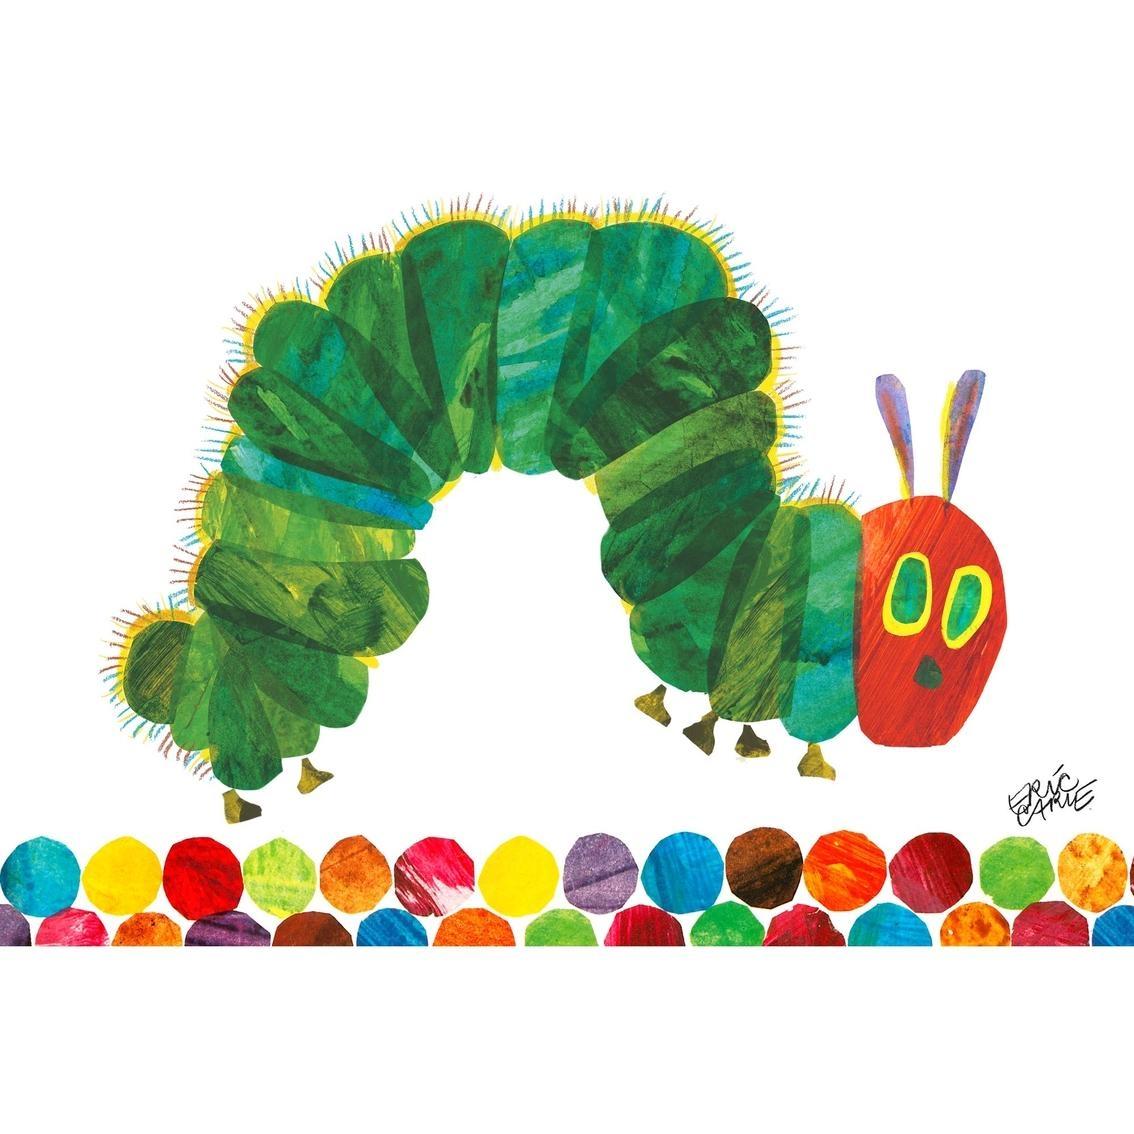 Greenbox Art 24 X 18 Eric Carle's The Very Hungry Caterpillar within The Very Hungry Caterpillar Wall Art